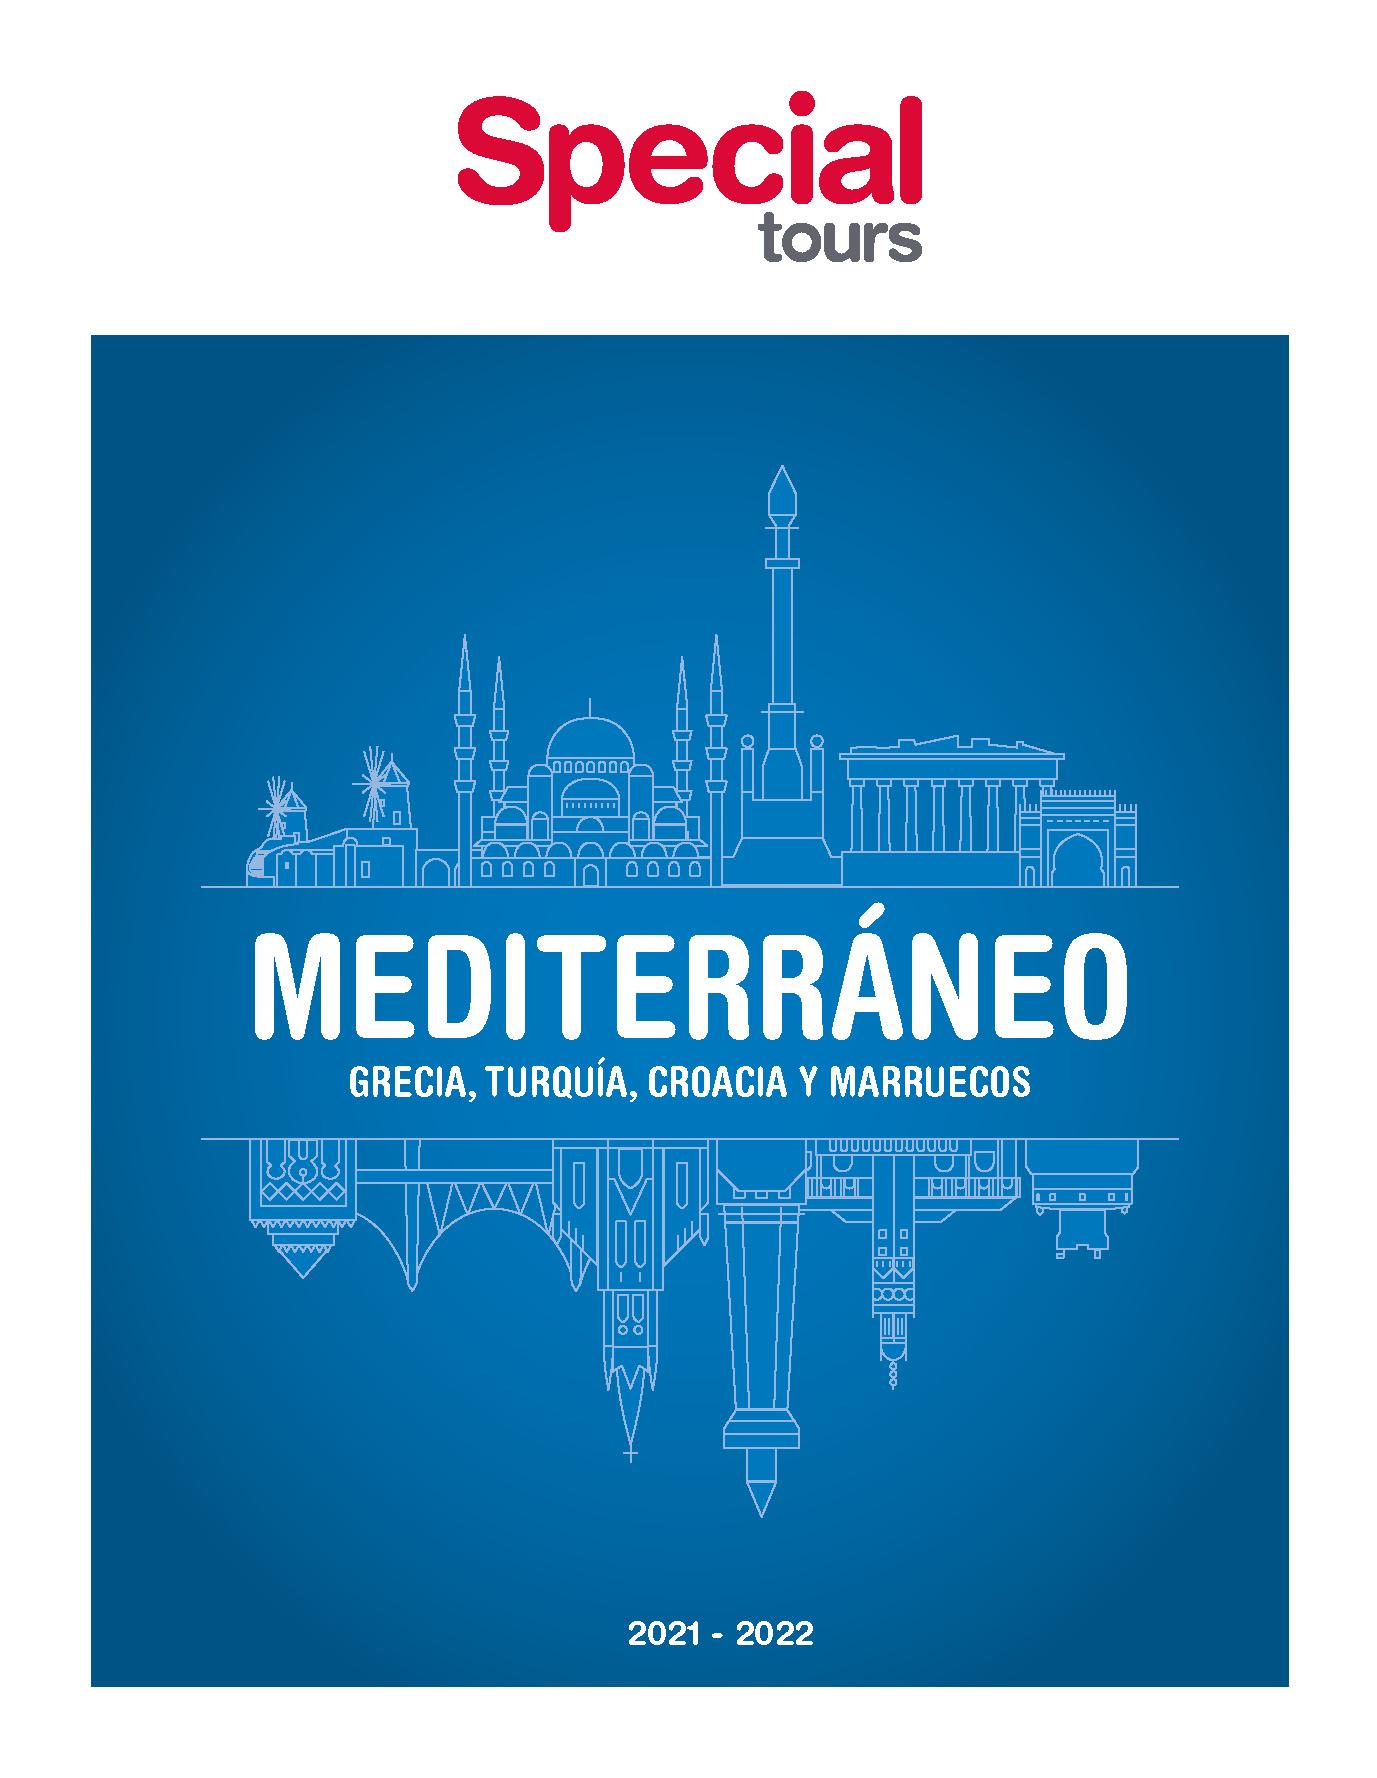 Catalogo Special Tours Mediterraneo 2021-2022